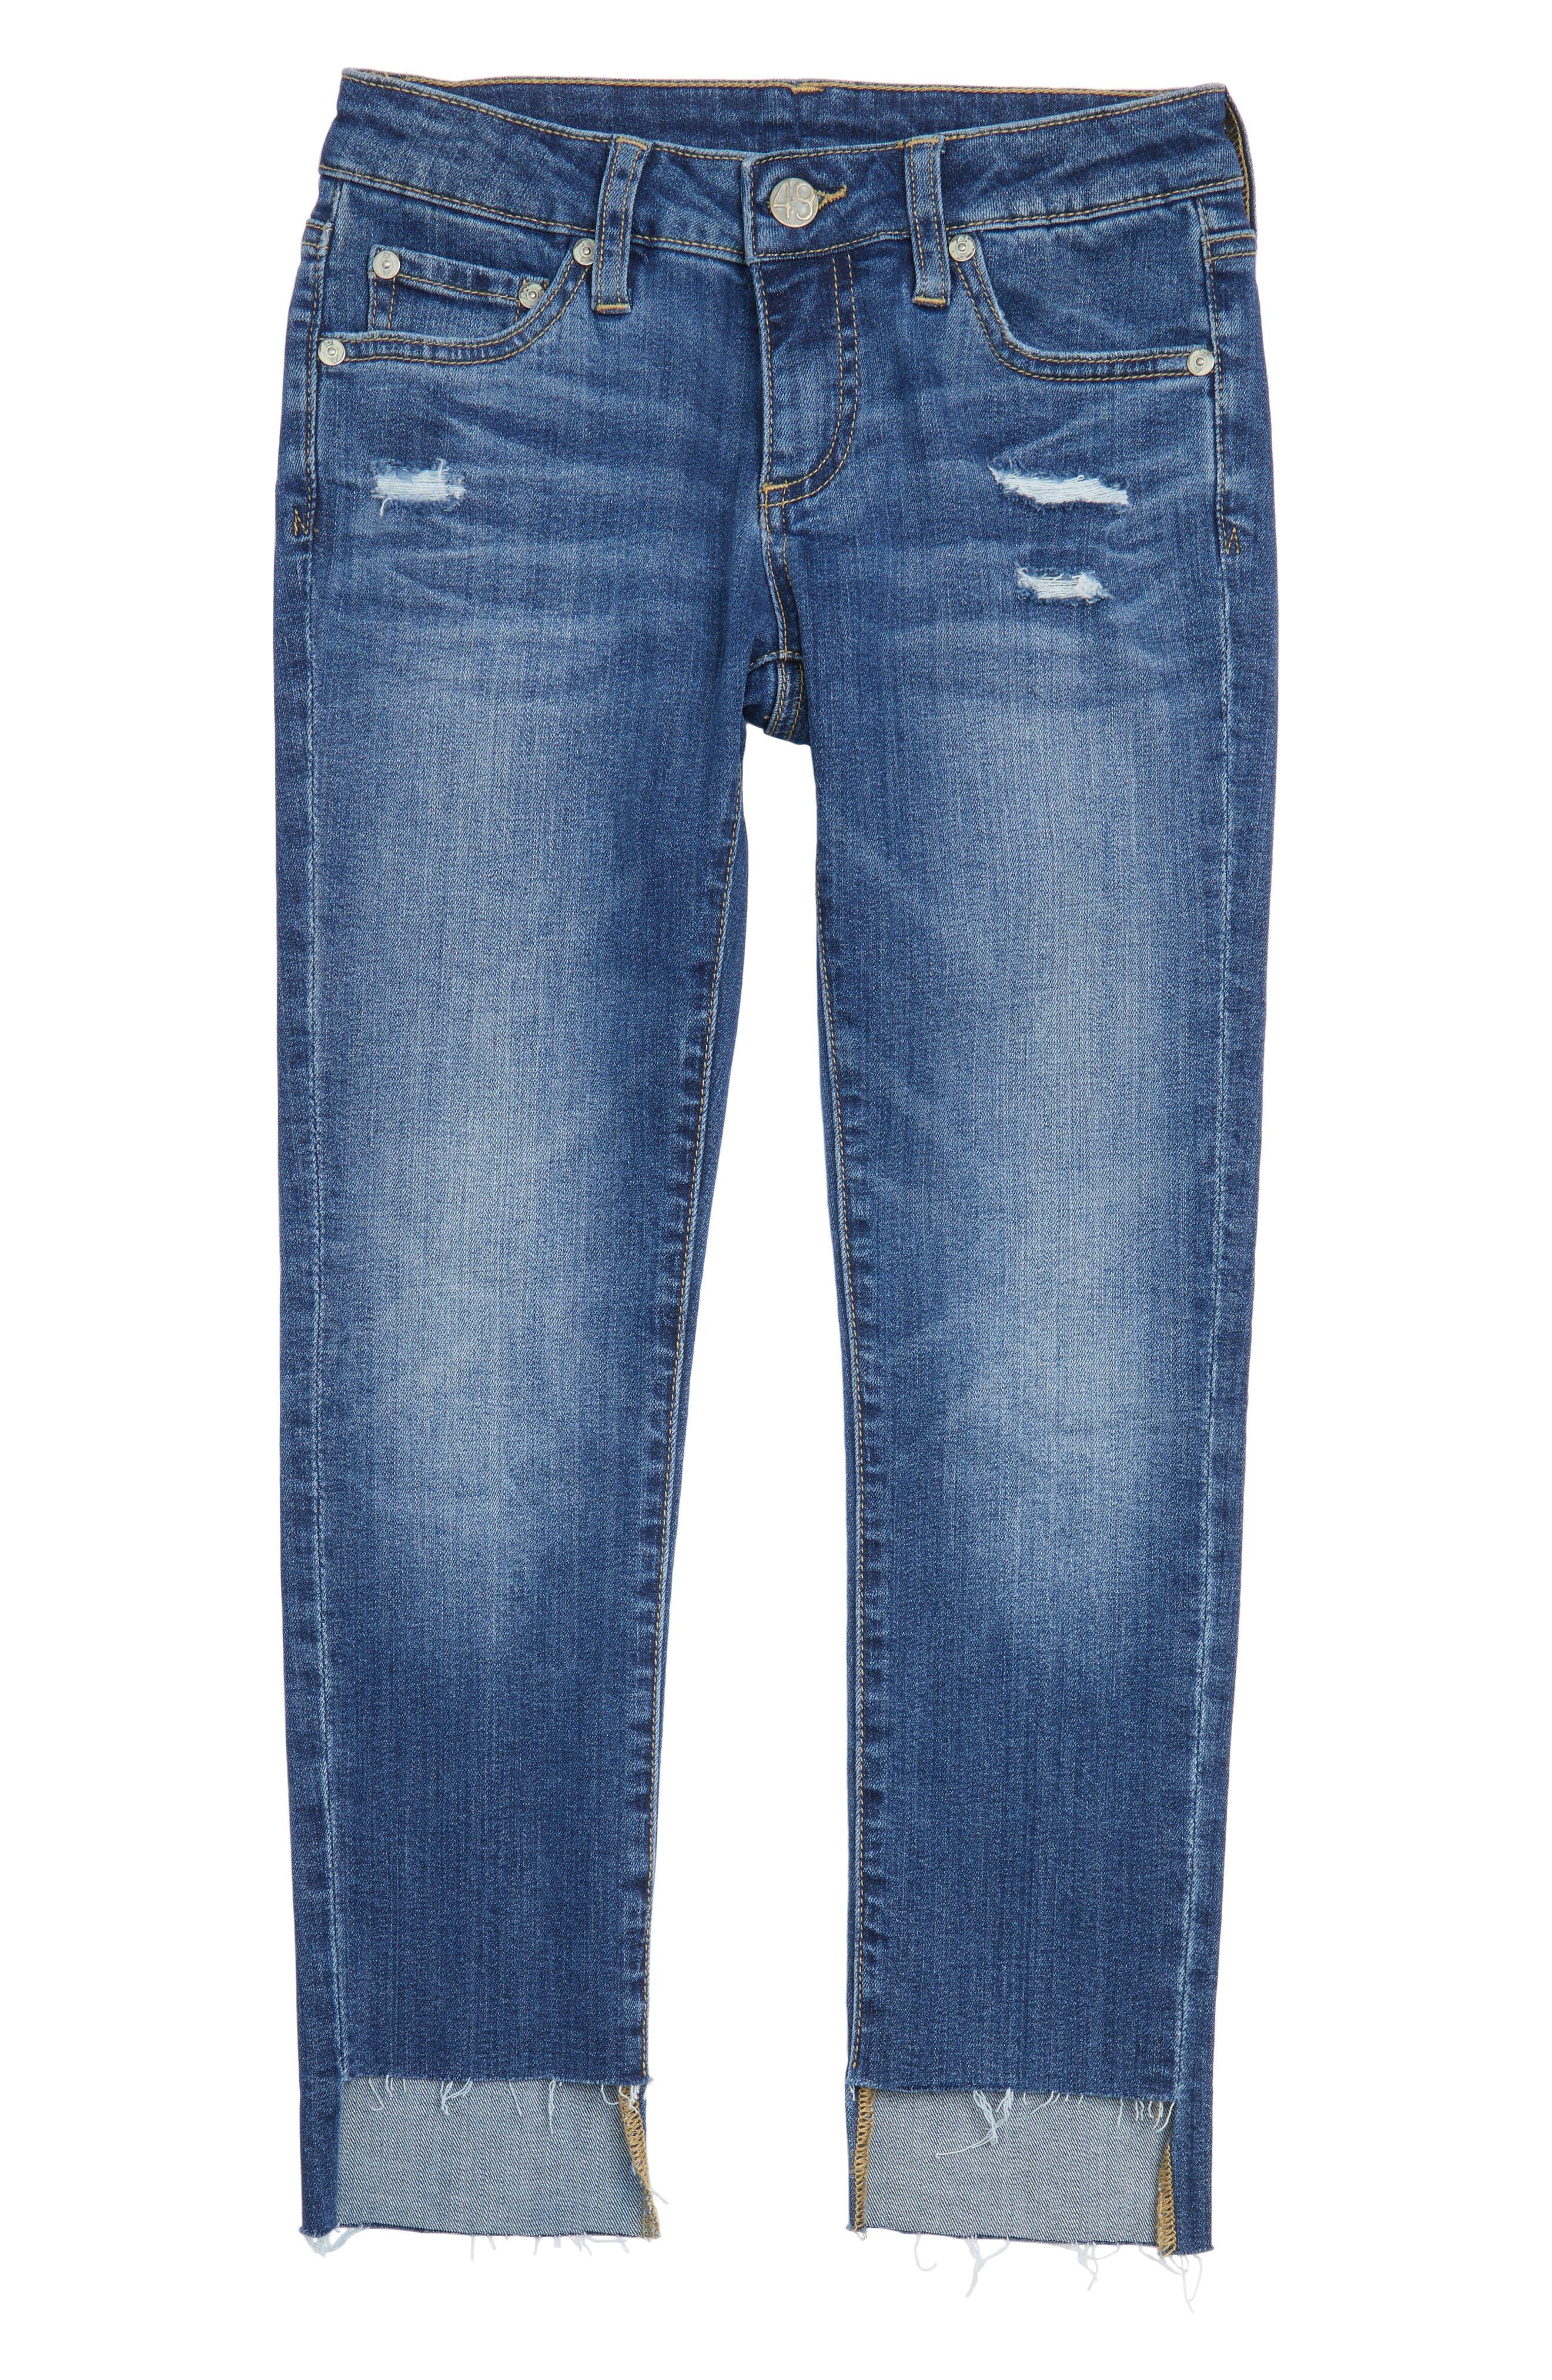 Main Image - ag adriano goldschmied kids The Kate Slim Straight Leg Jeans (Big Girls)